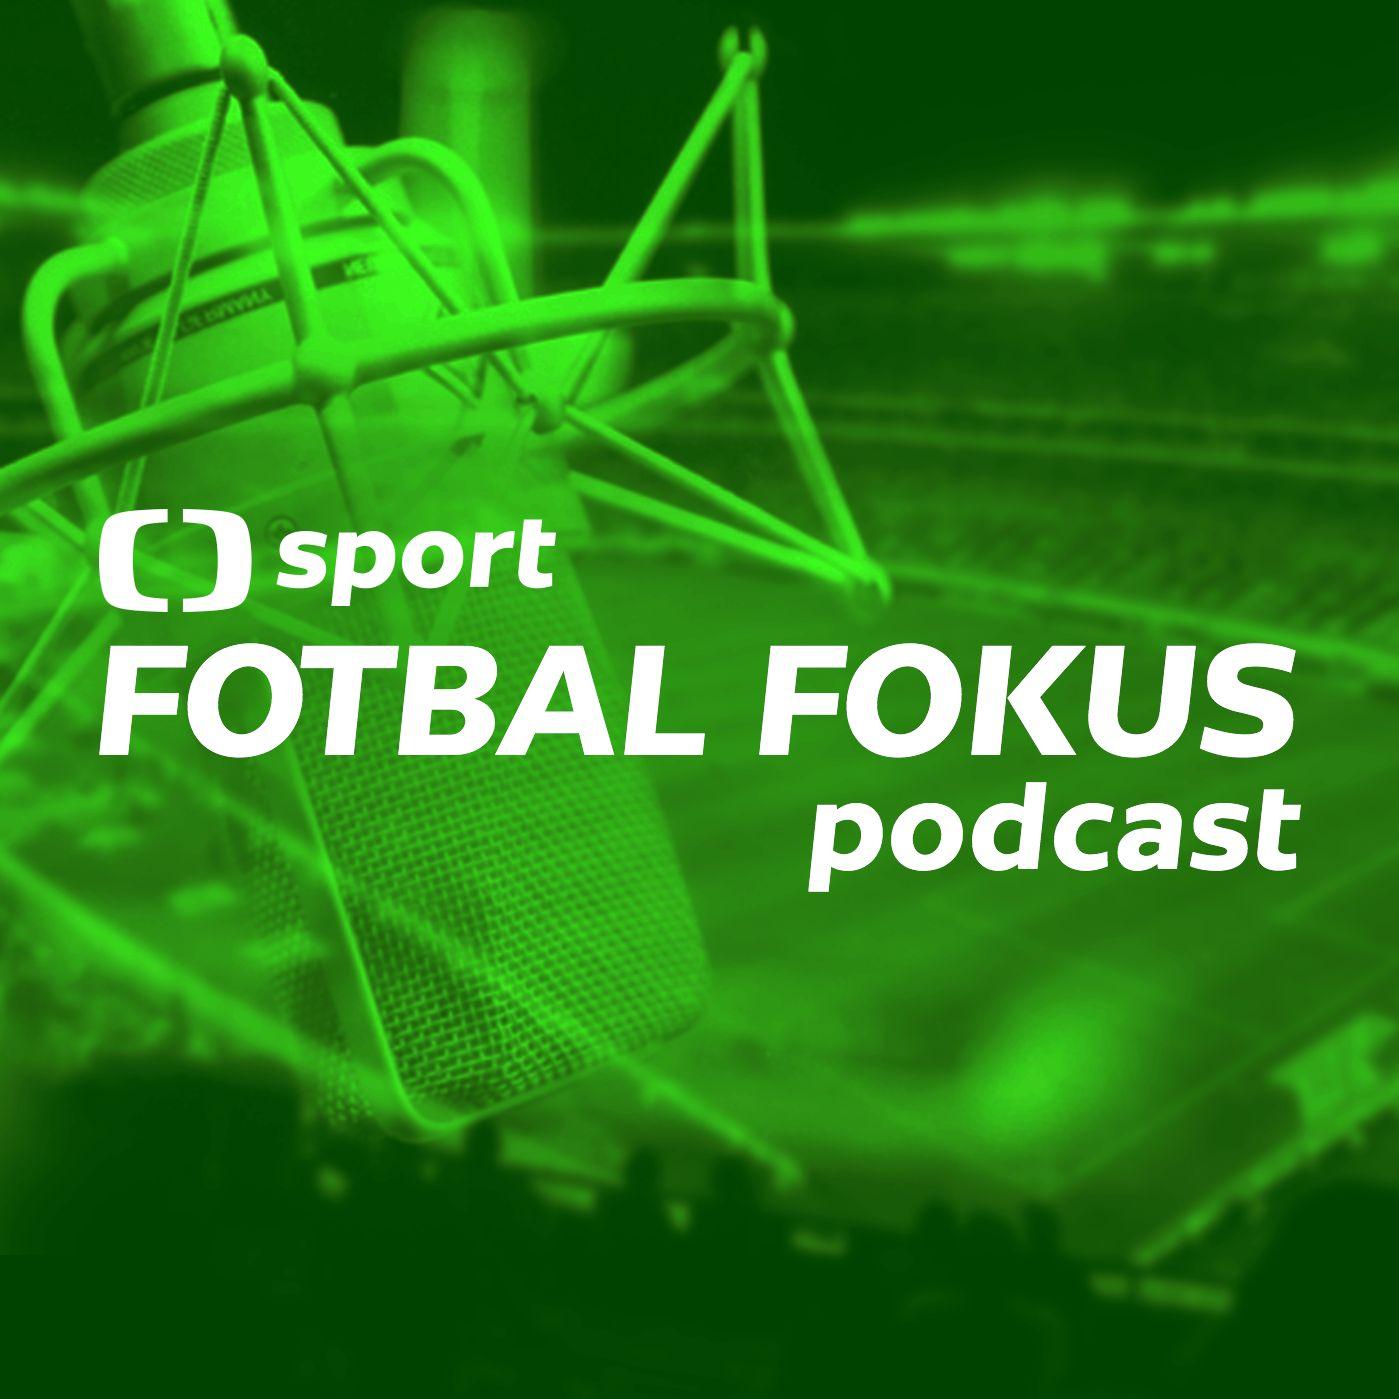 Fotbal fokus podcast: Má sparťanský tah Stramaccionim smysl? A vyhraje titul Slavia, nebo Plzeň?